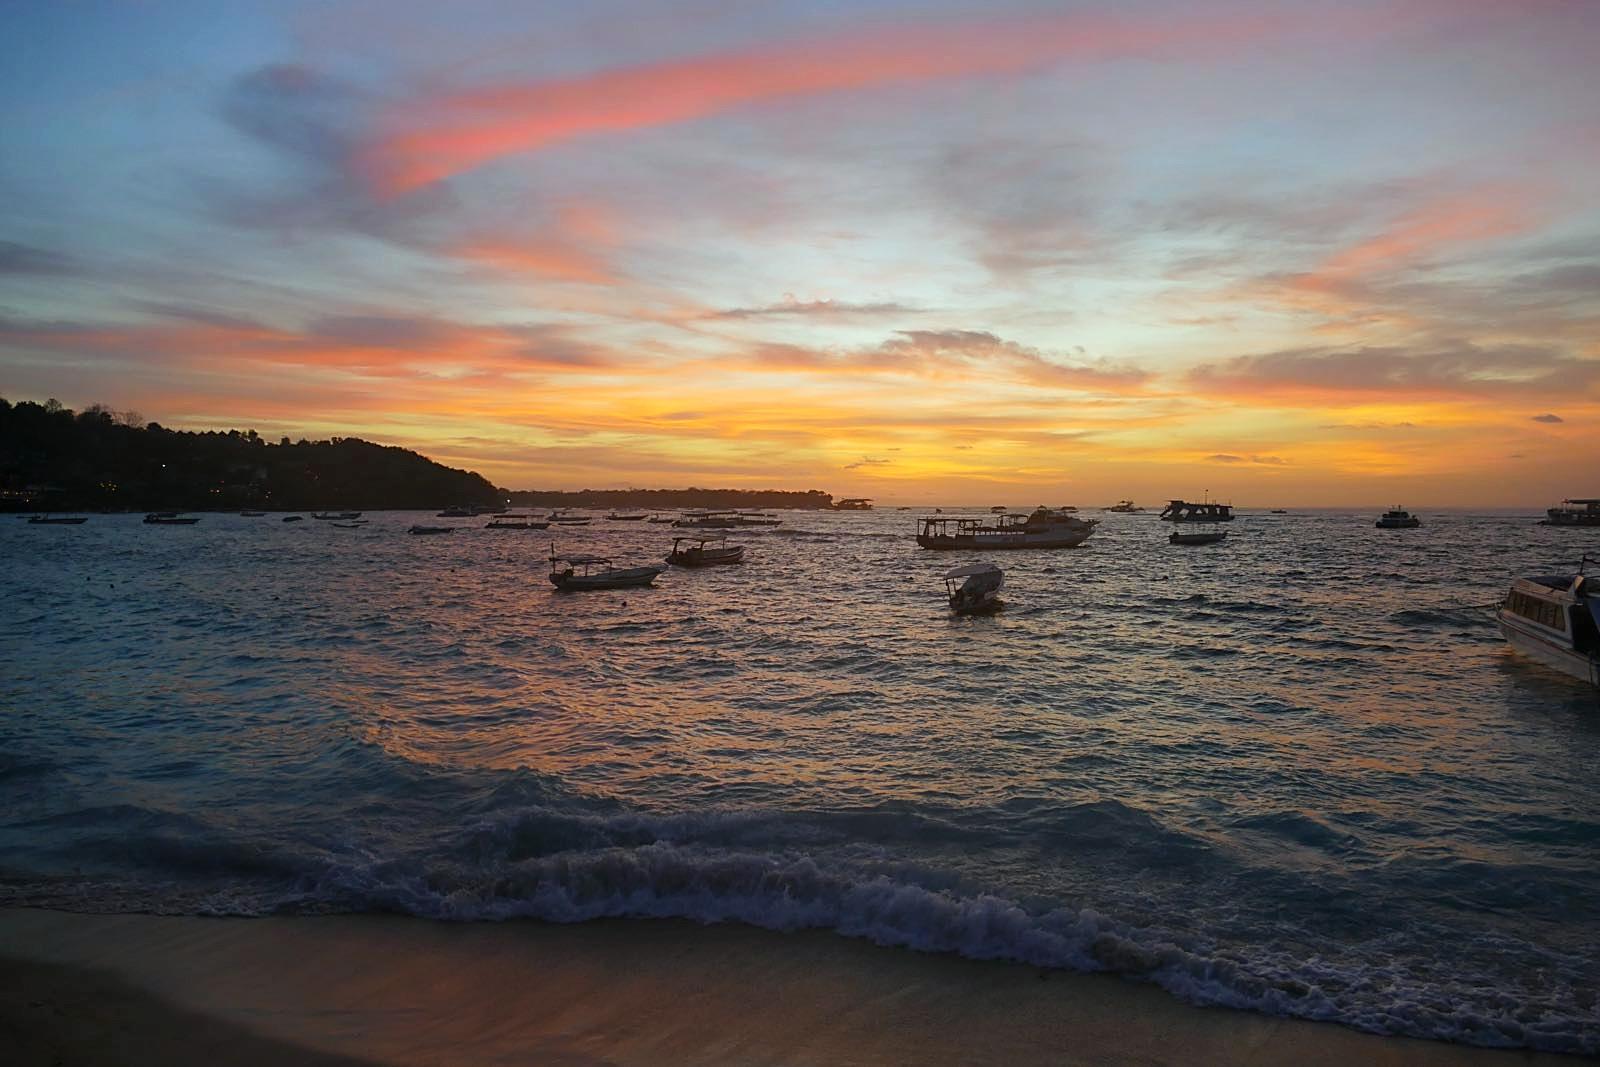 Sonnenuntergang in Lembongan